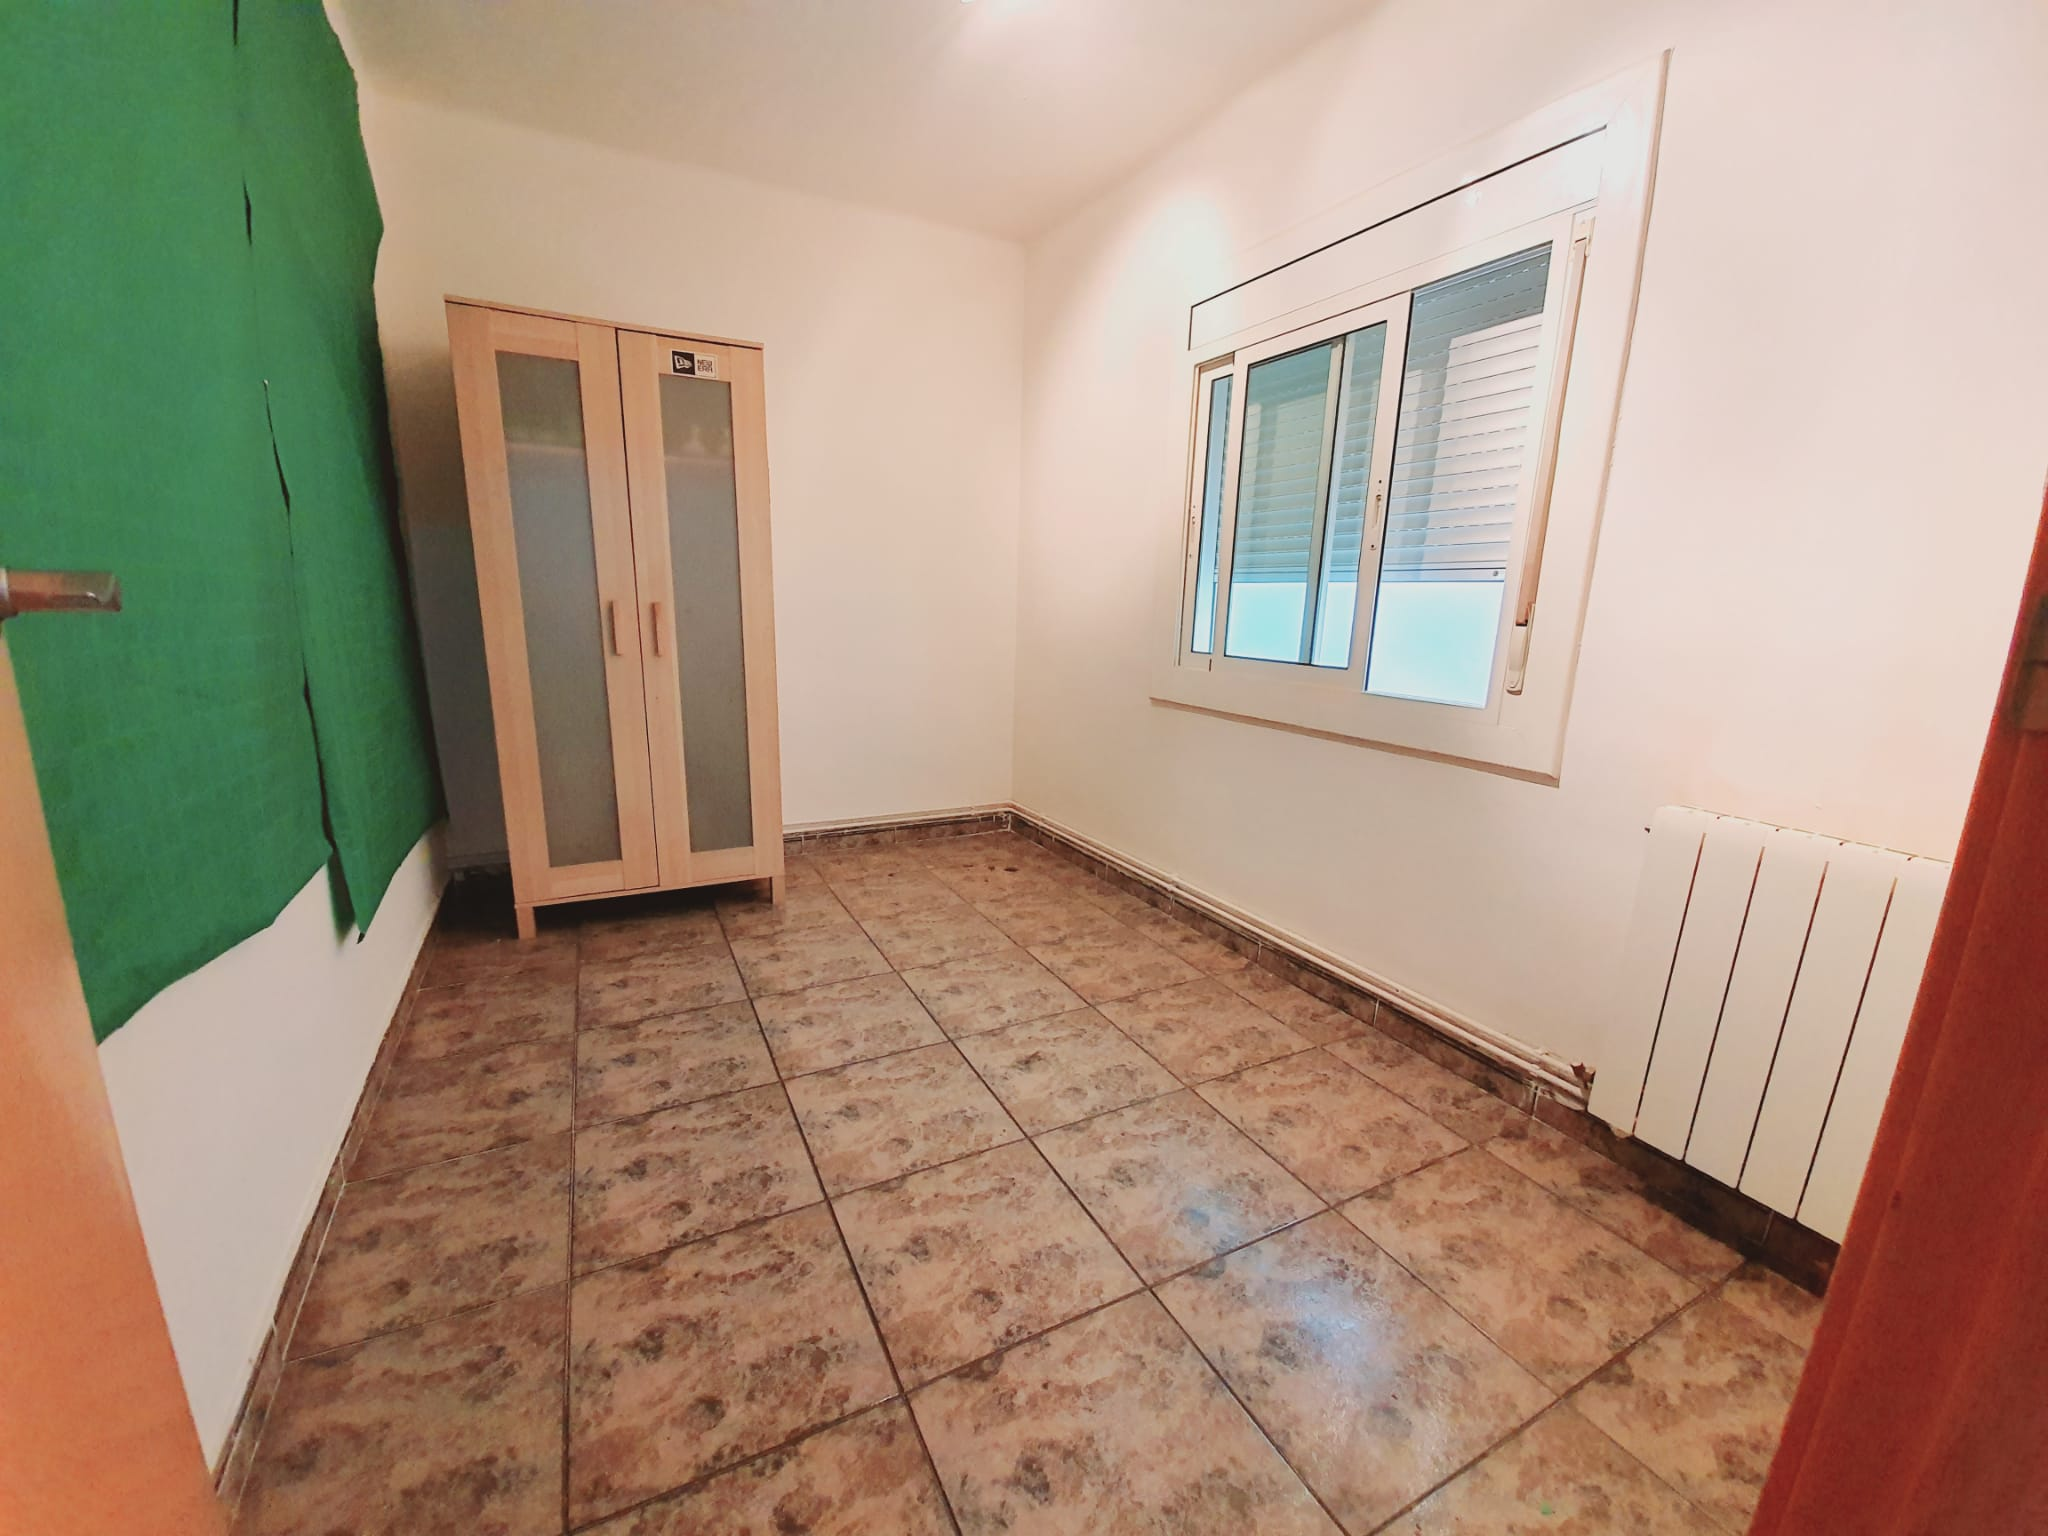 Piso en La florida en L'Hospitalet de llobregat en Venta por 145.000€